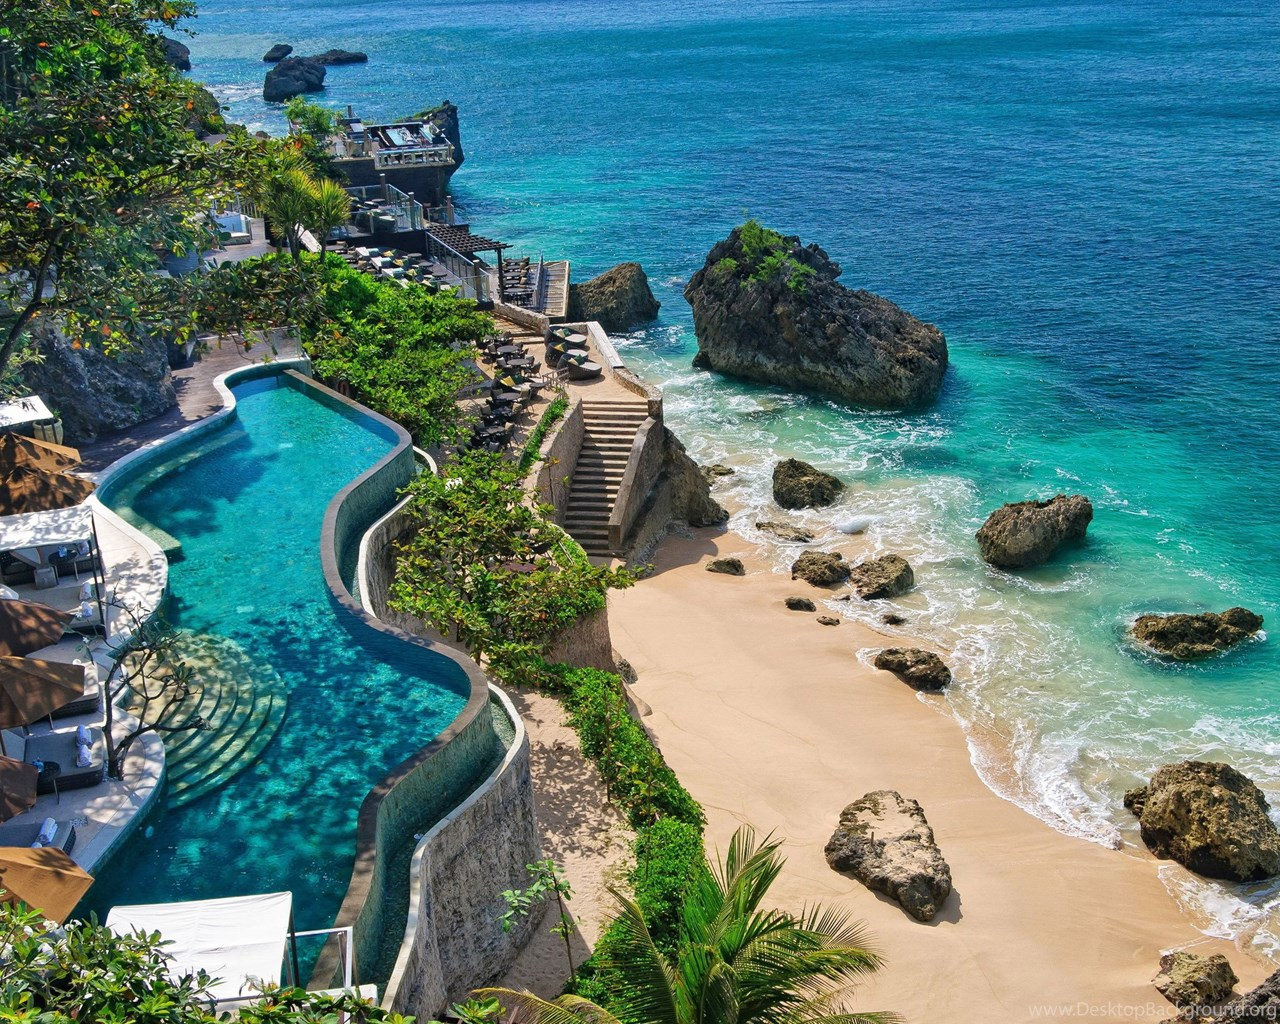 Download free bali beach wallpapers hd backgrounds desktop for Hotel in bali indonesia near beach